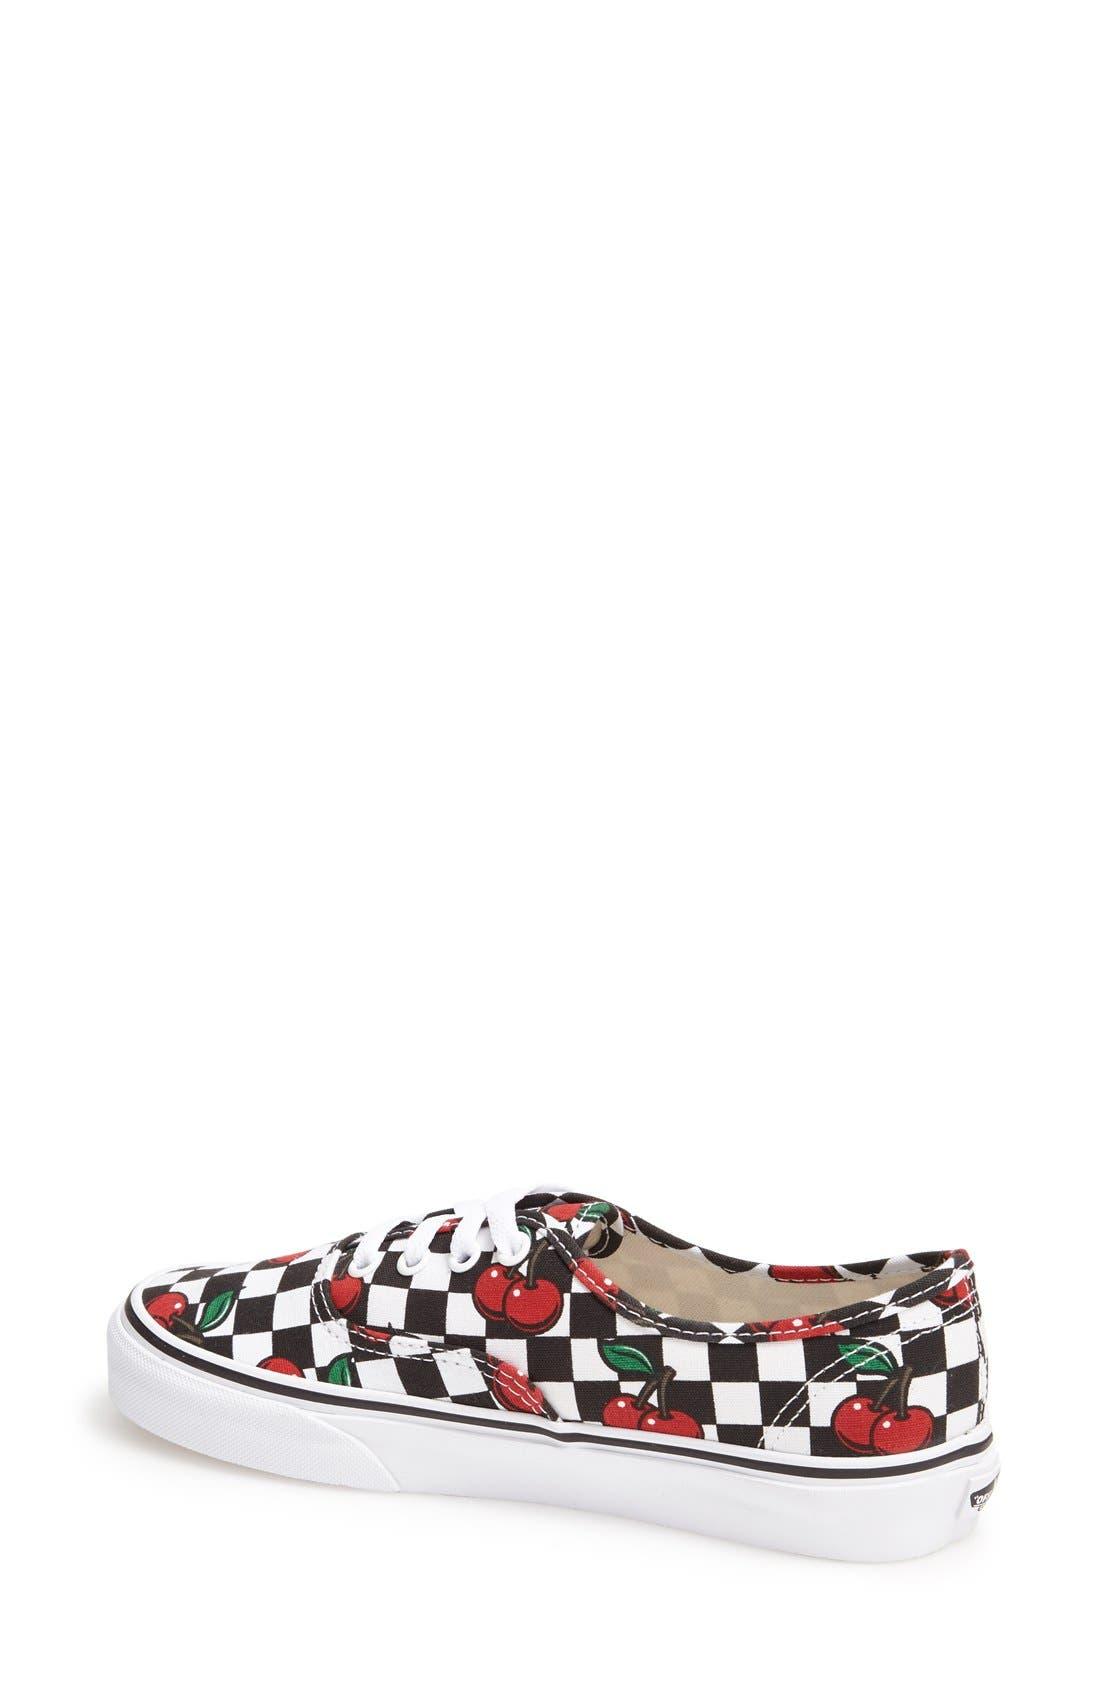 Alternate Image 2  - Vans 'Authentic - Cherry' Sneaker (Women)